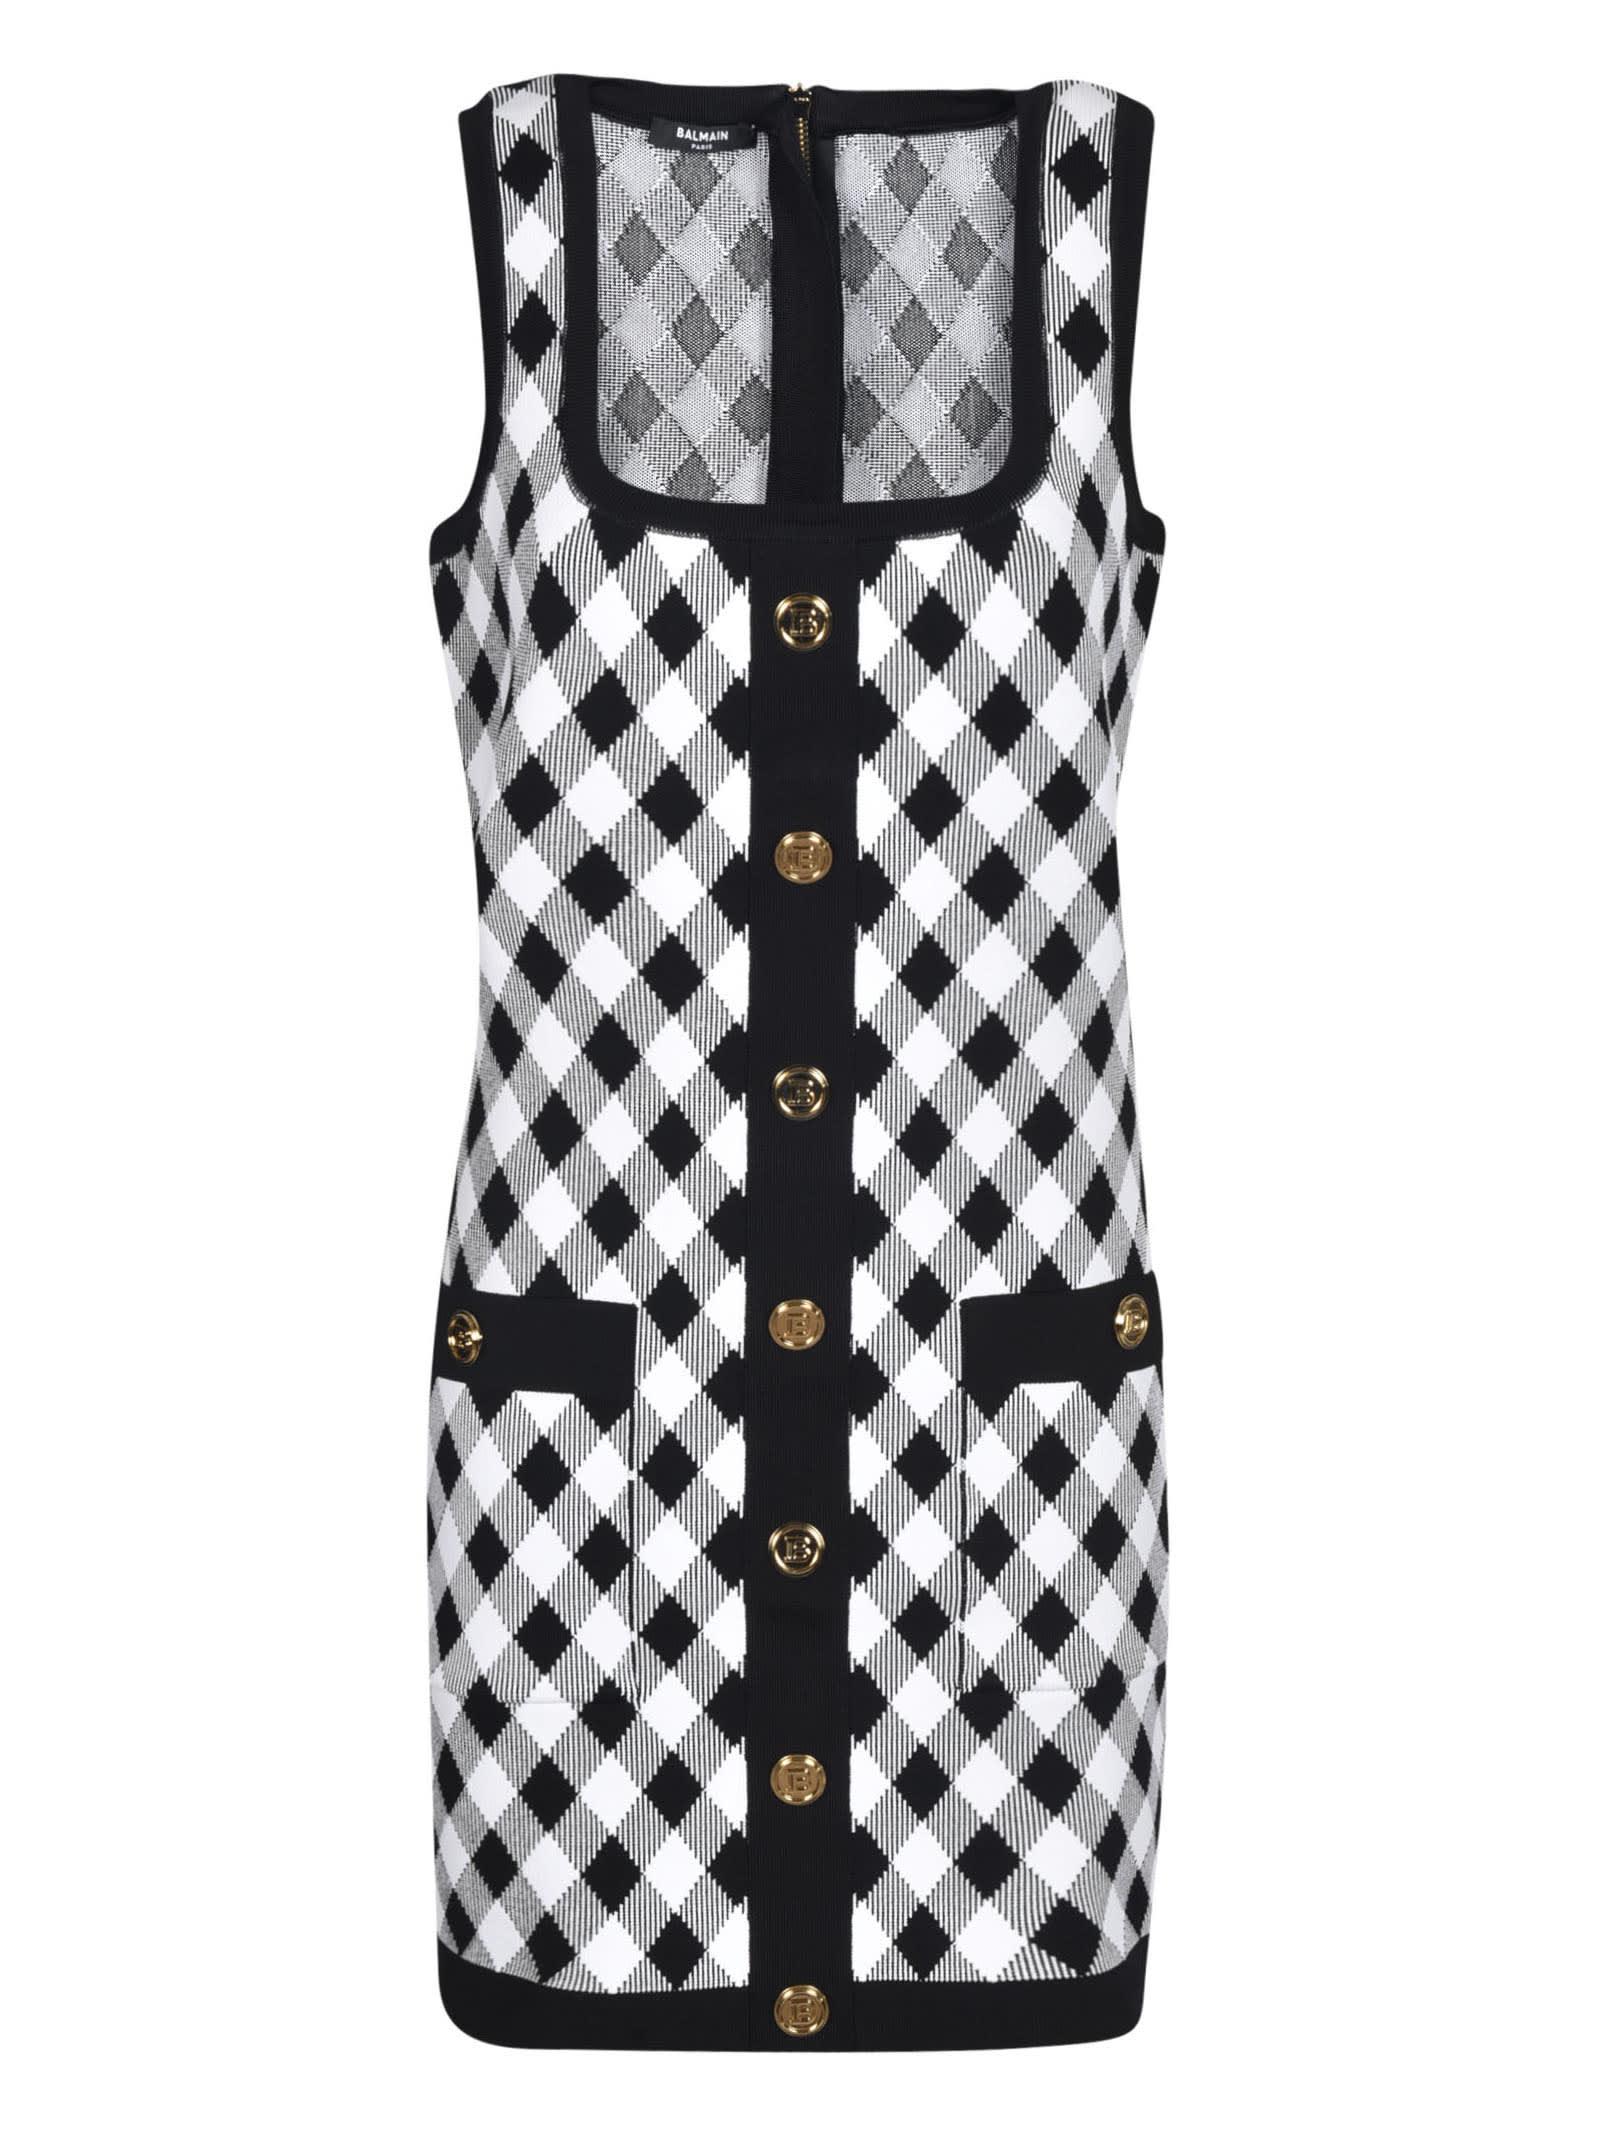 Balmain Sleeveless Button Embellished Dress